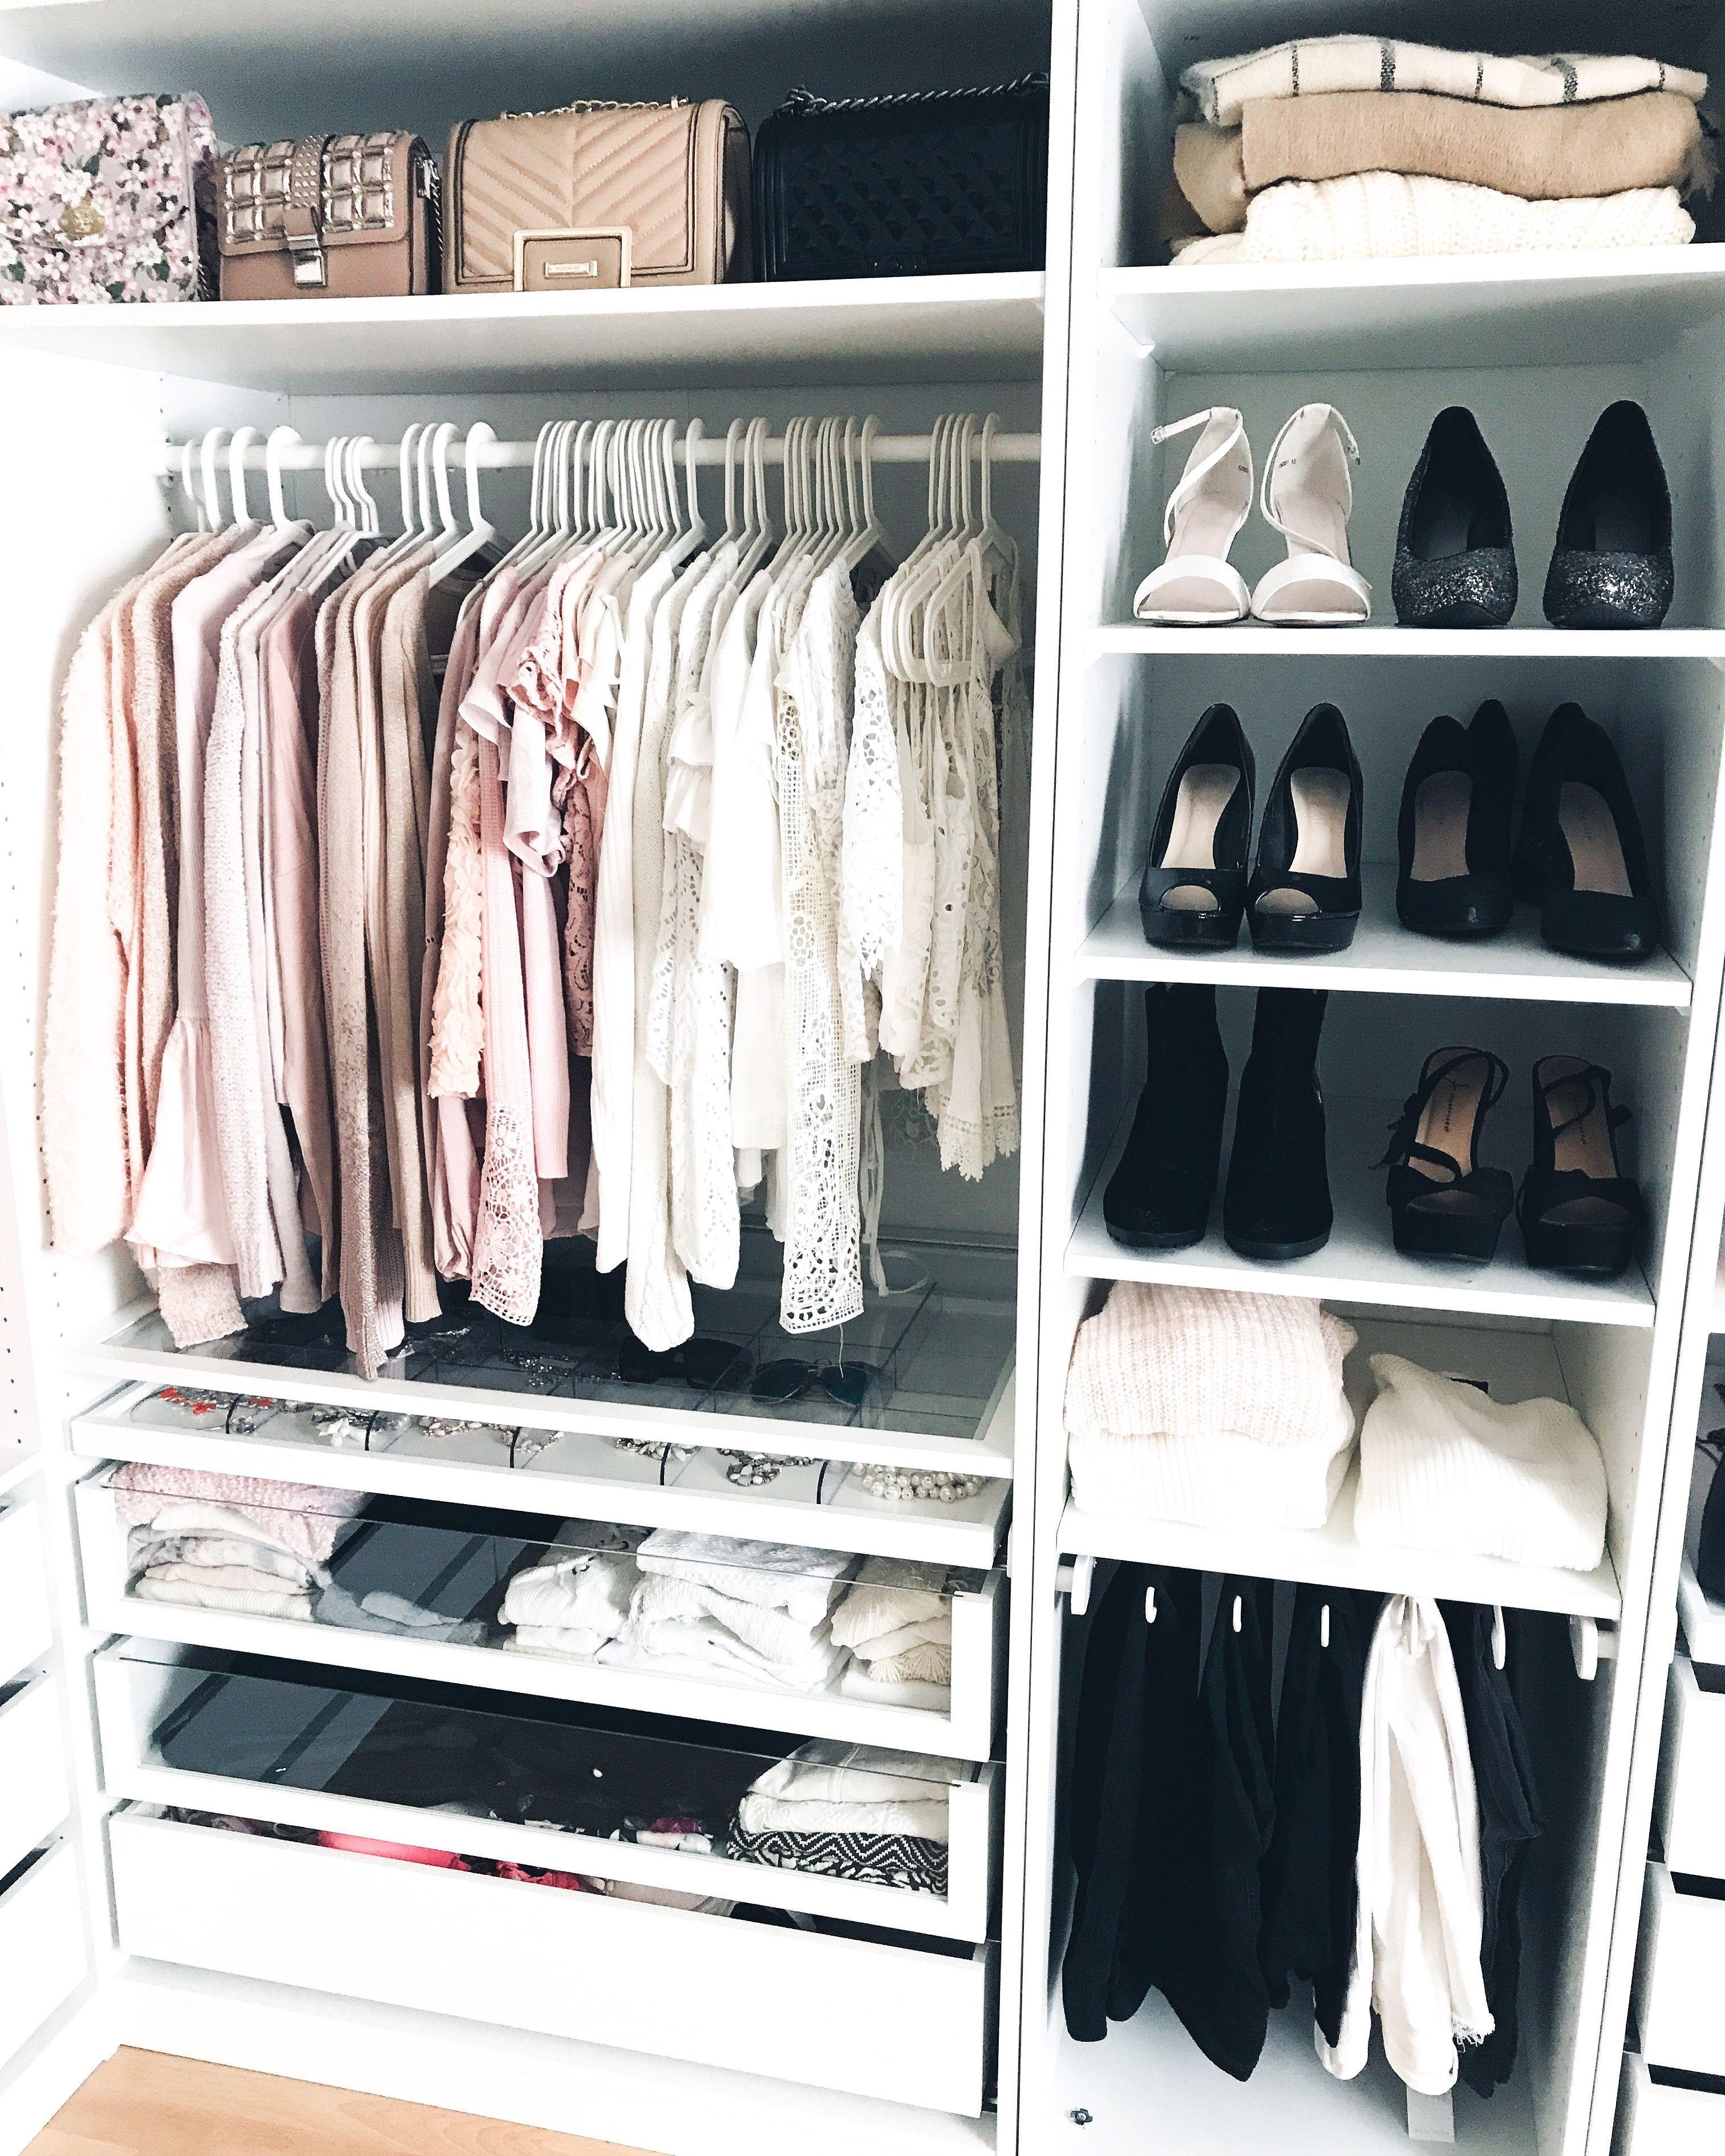 Walk In Closet #Walkincloset #Wardrobe #Ikea #Ikeahack #Ikealover #Pax #